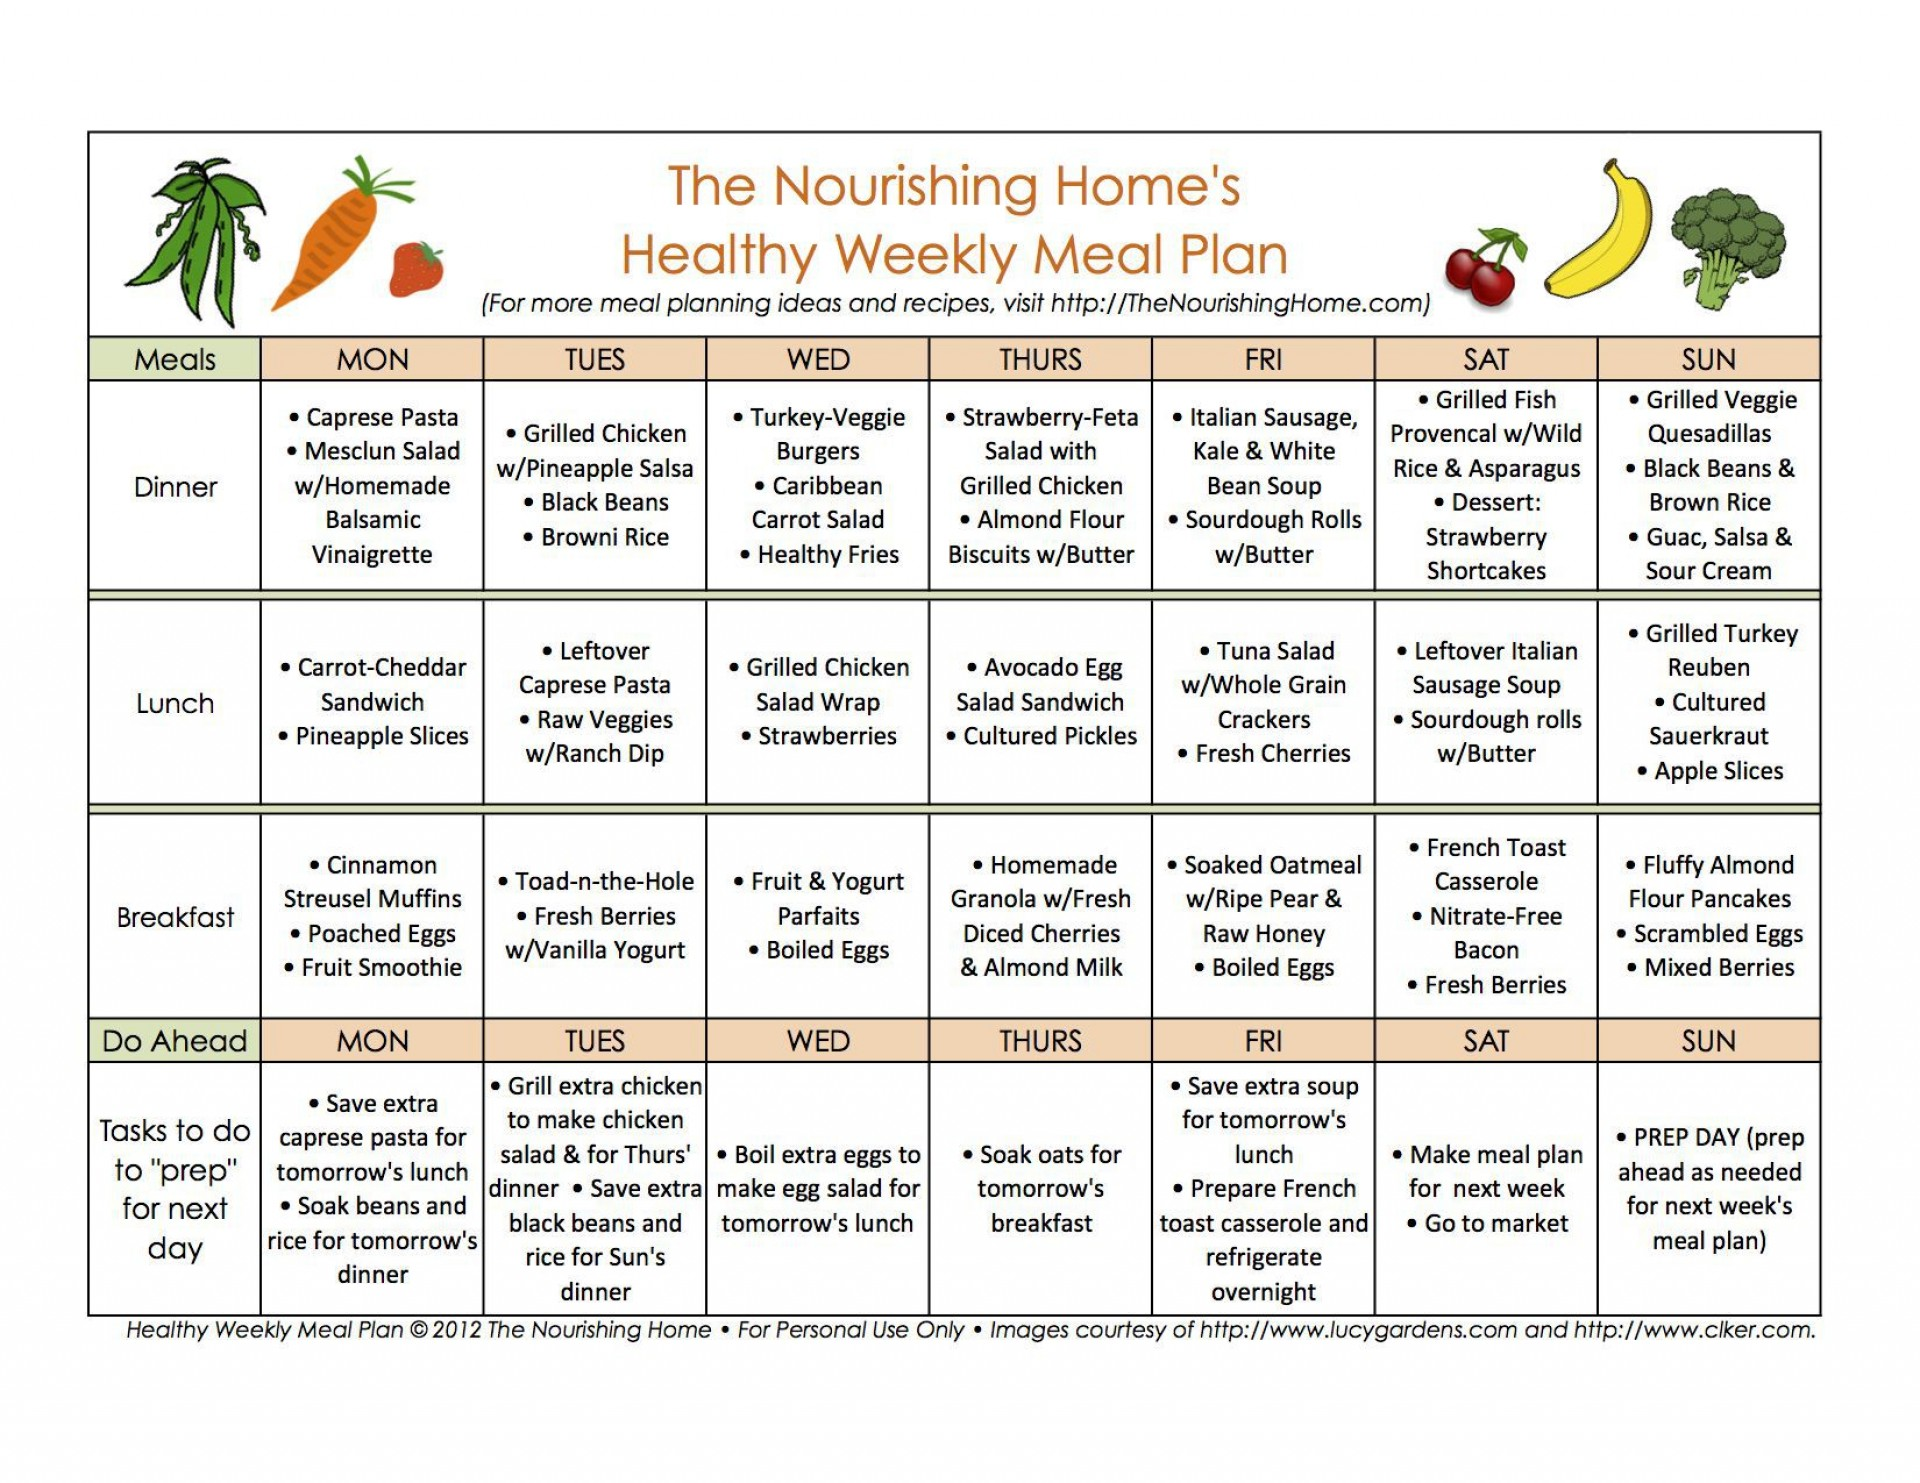 001 Impressive Weekly Meal Plan Example Sample  Examples 1 Week Template One1920